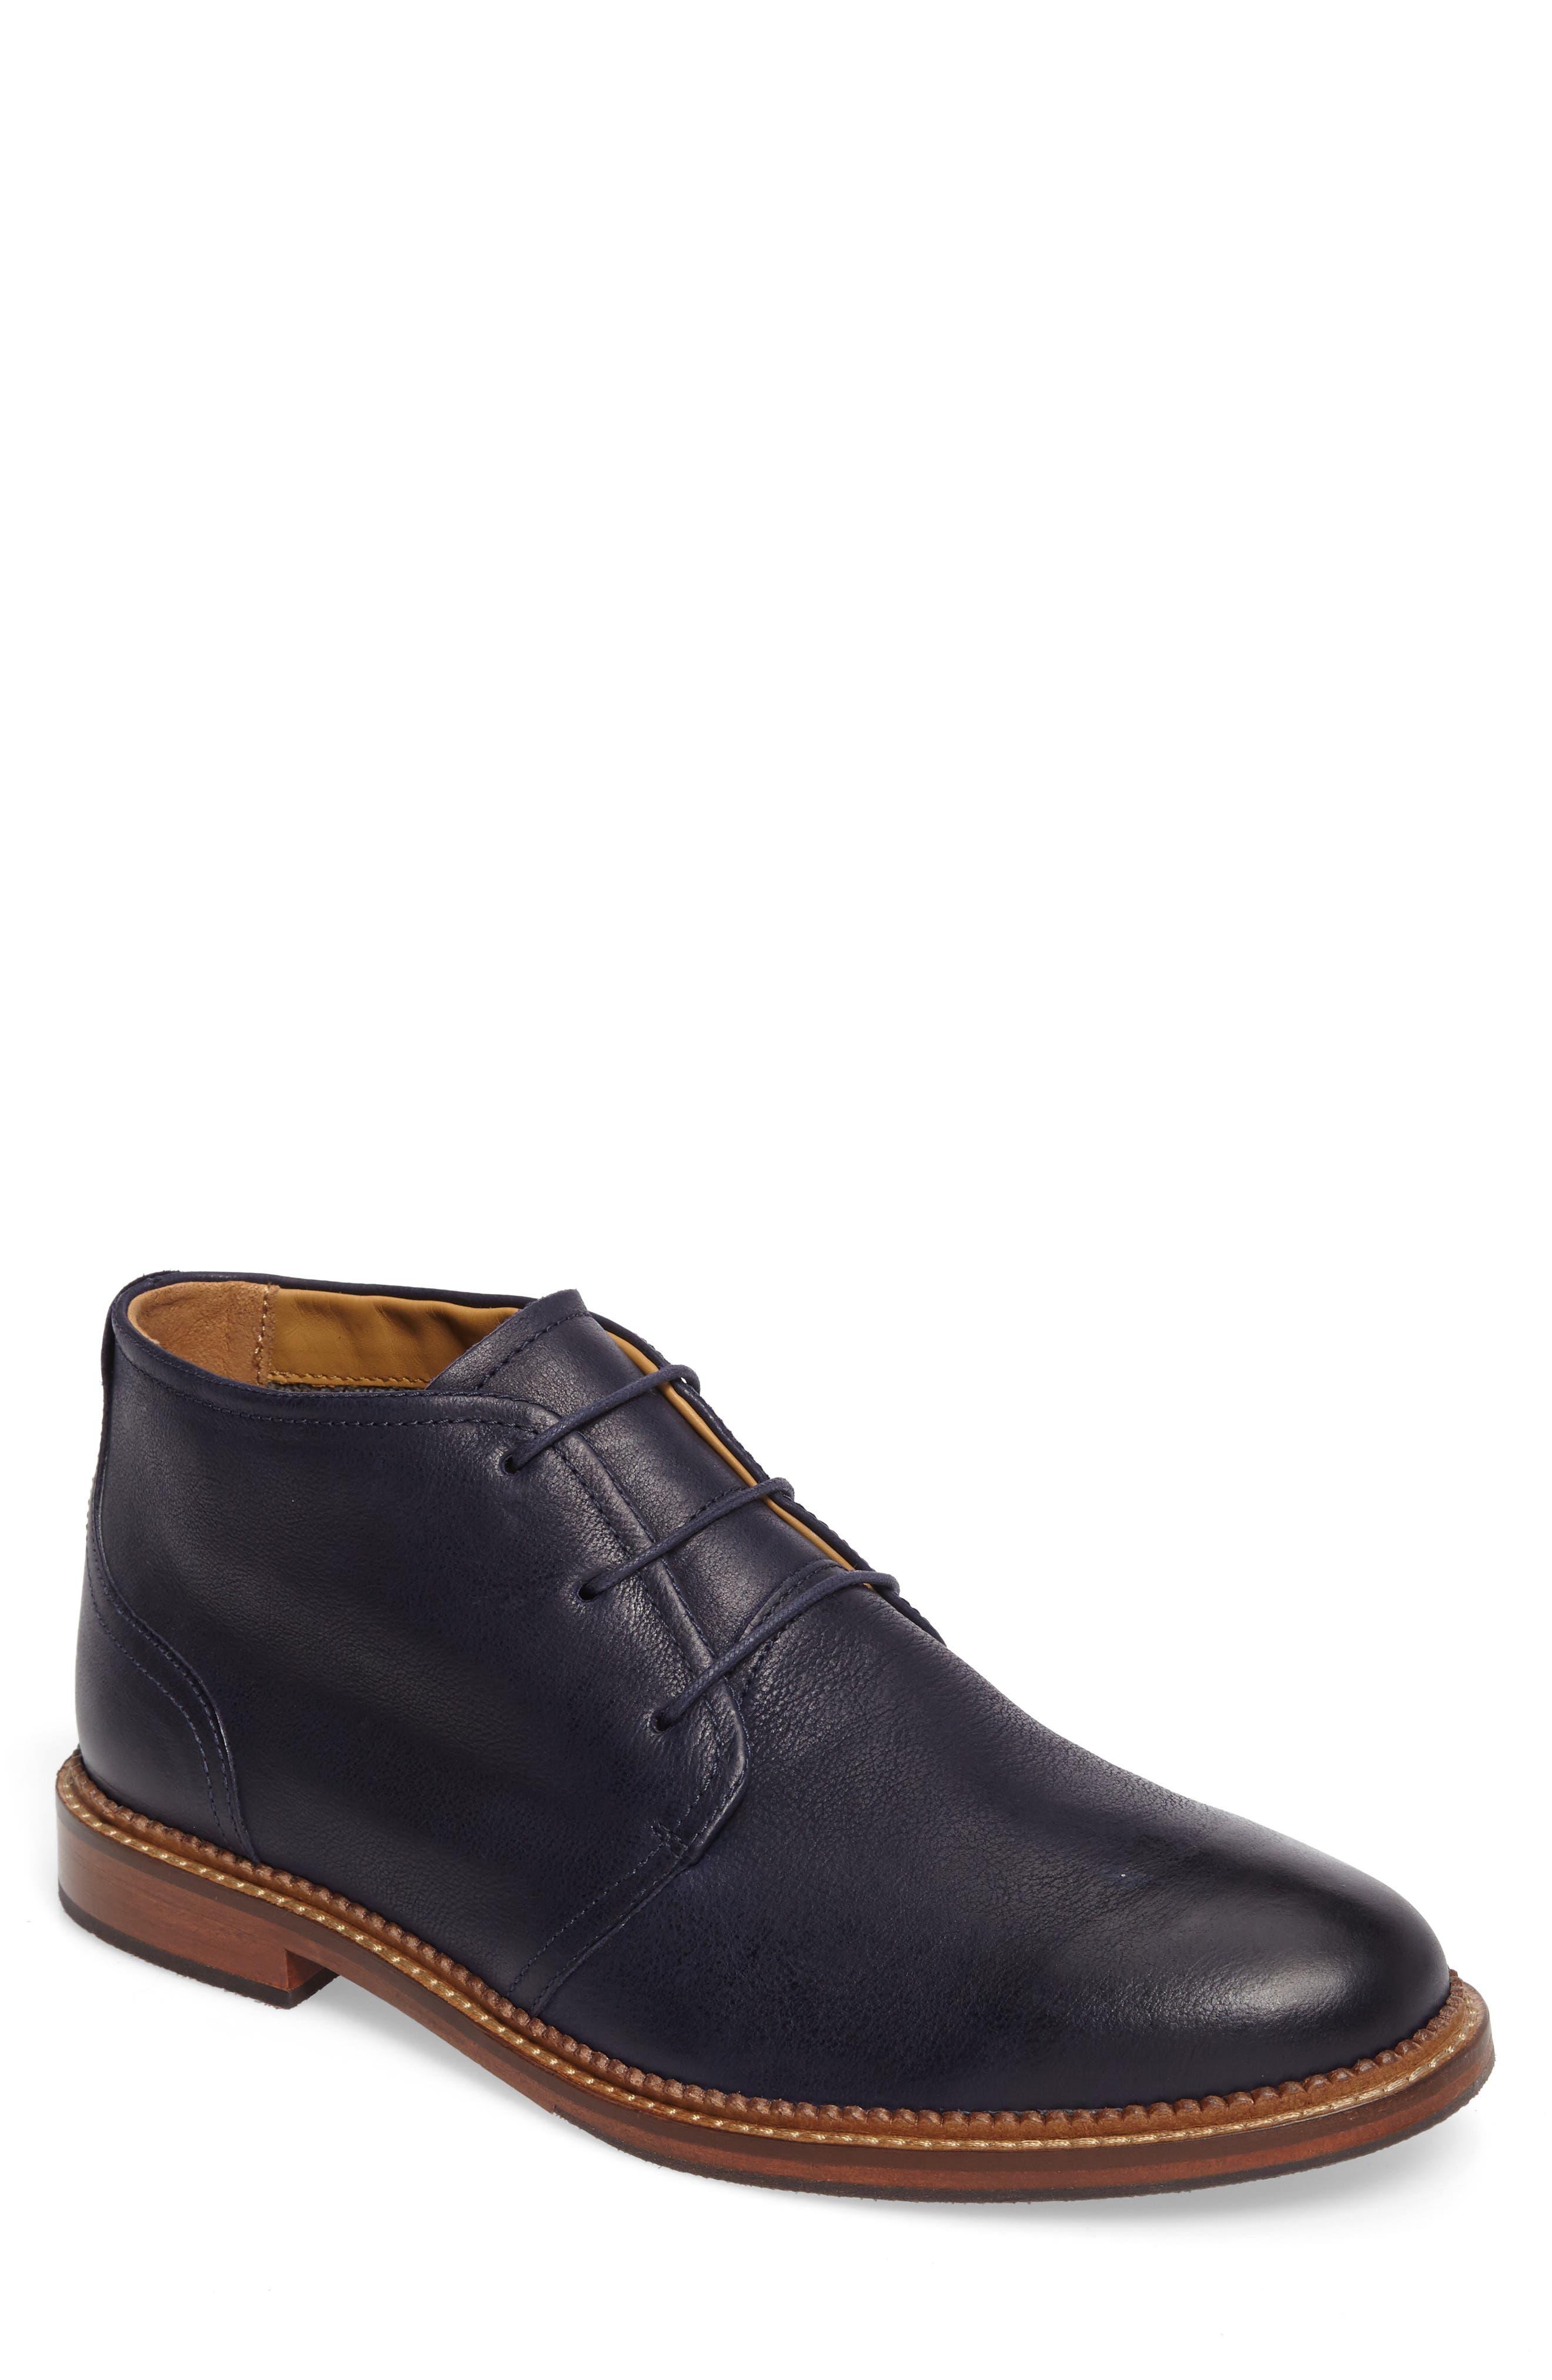 J SHOES 'Monarch Plus' Chukka Boot (Men)